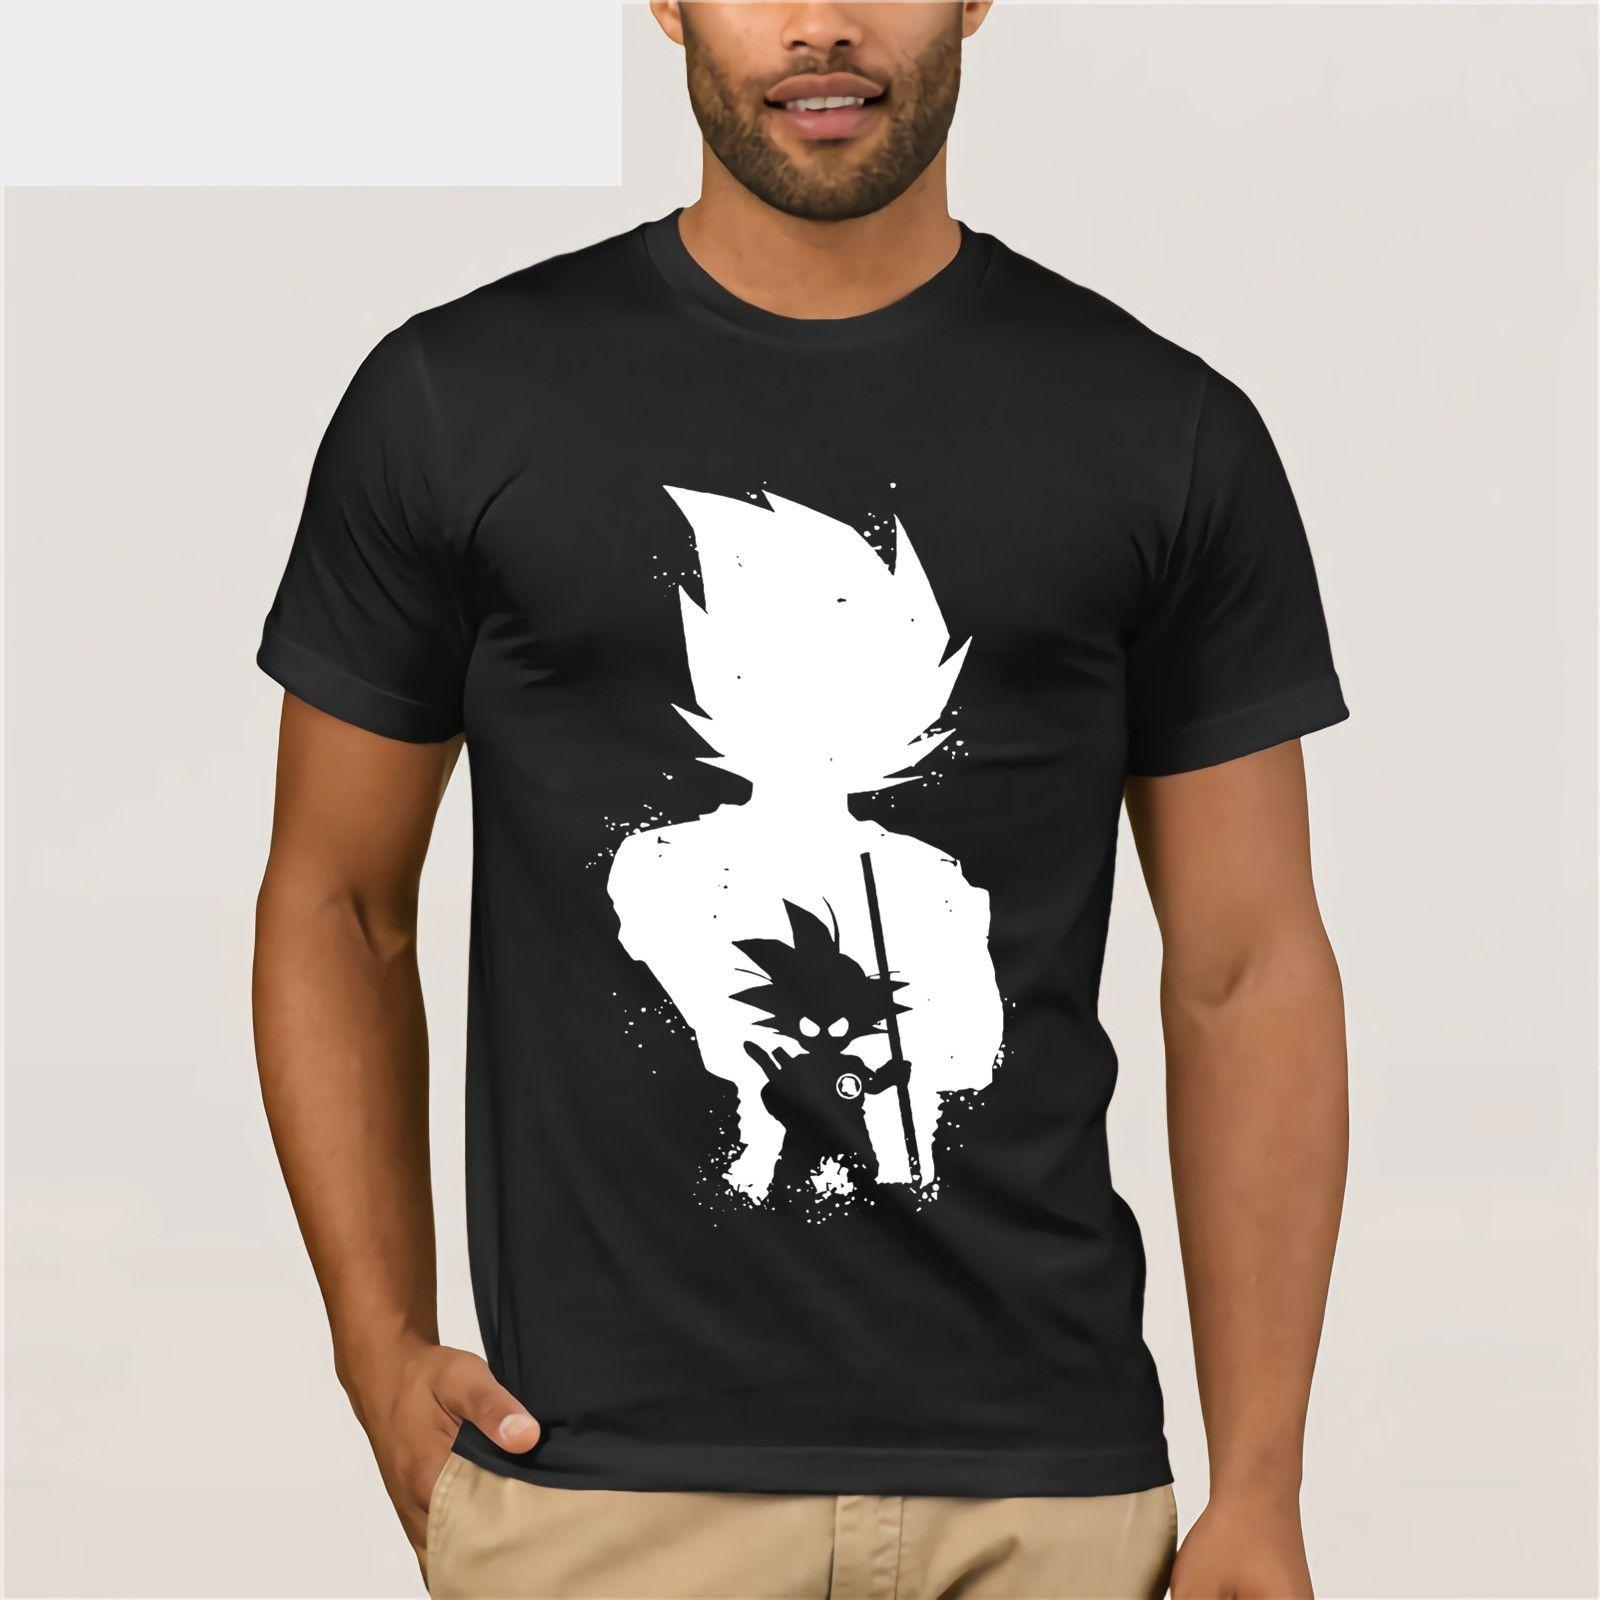 affbda0c818b Anime Dragon Ball Z Vegeta Super Saiyan Goku Piccolo 3D T Shirt Men Costume  Casual Tee T Shirt Men Camiseta Buy Funny Shirts Interesting Tee Shirts  From ...